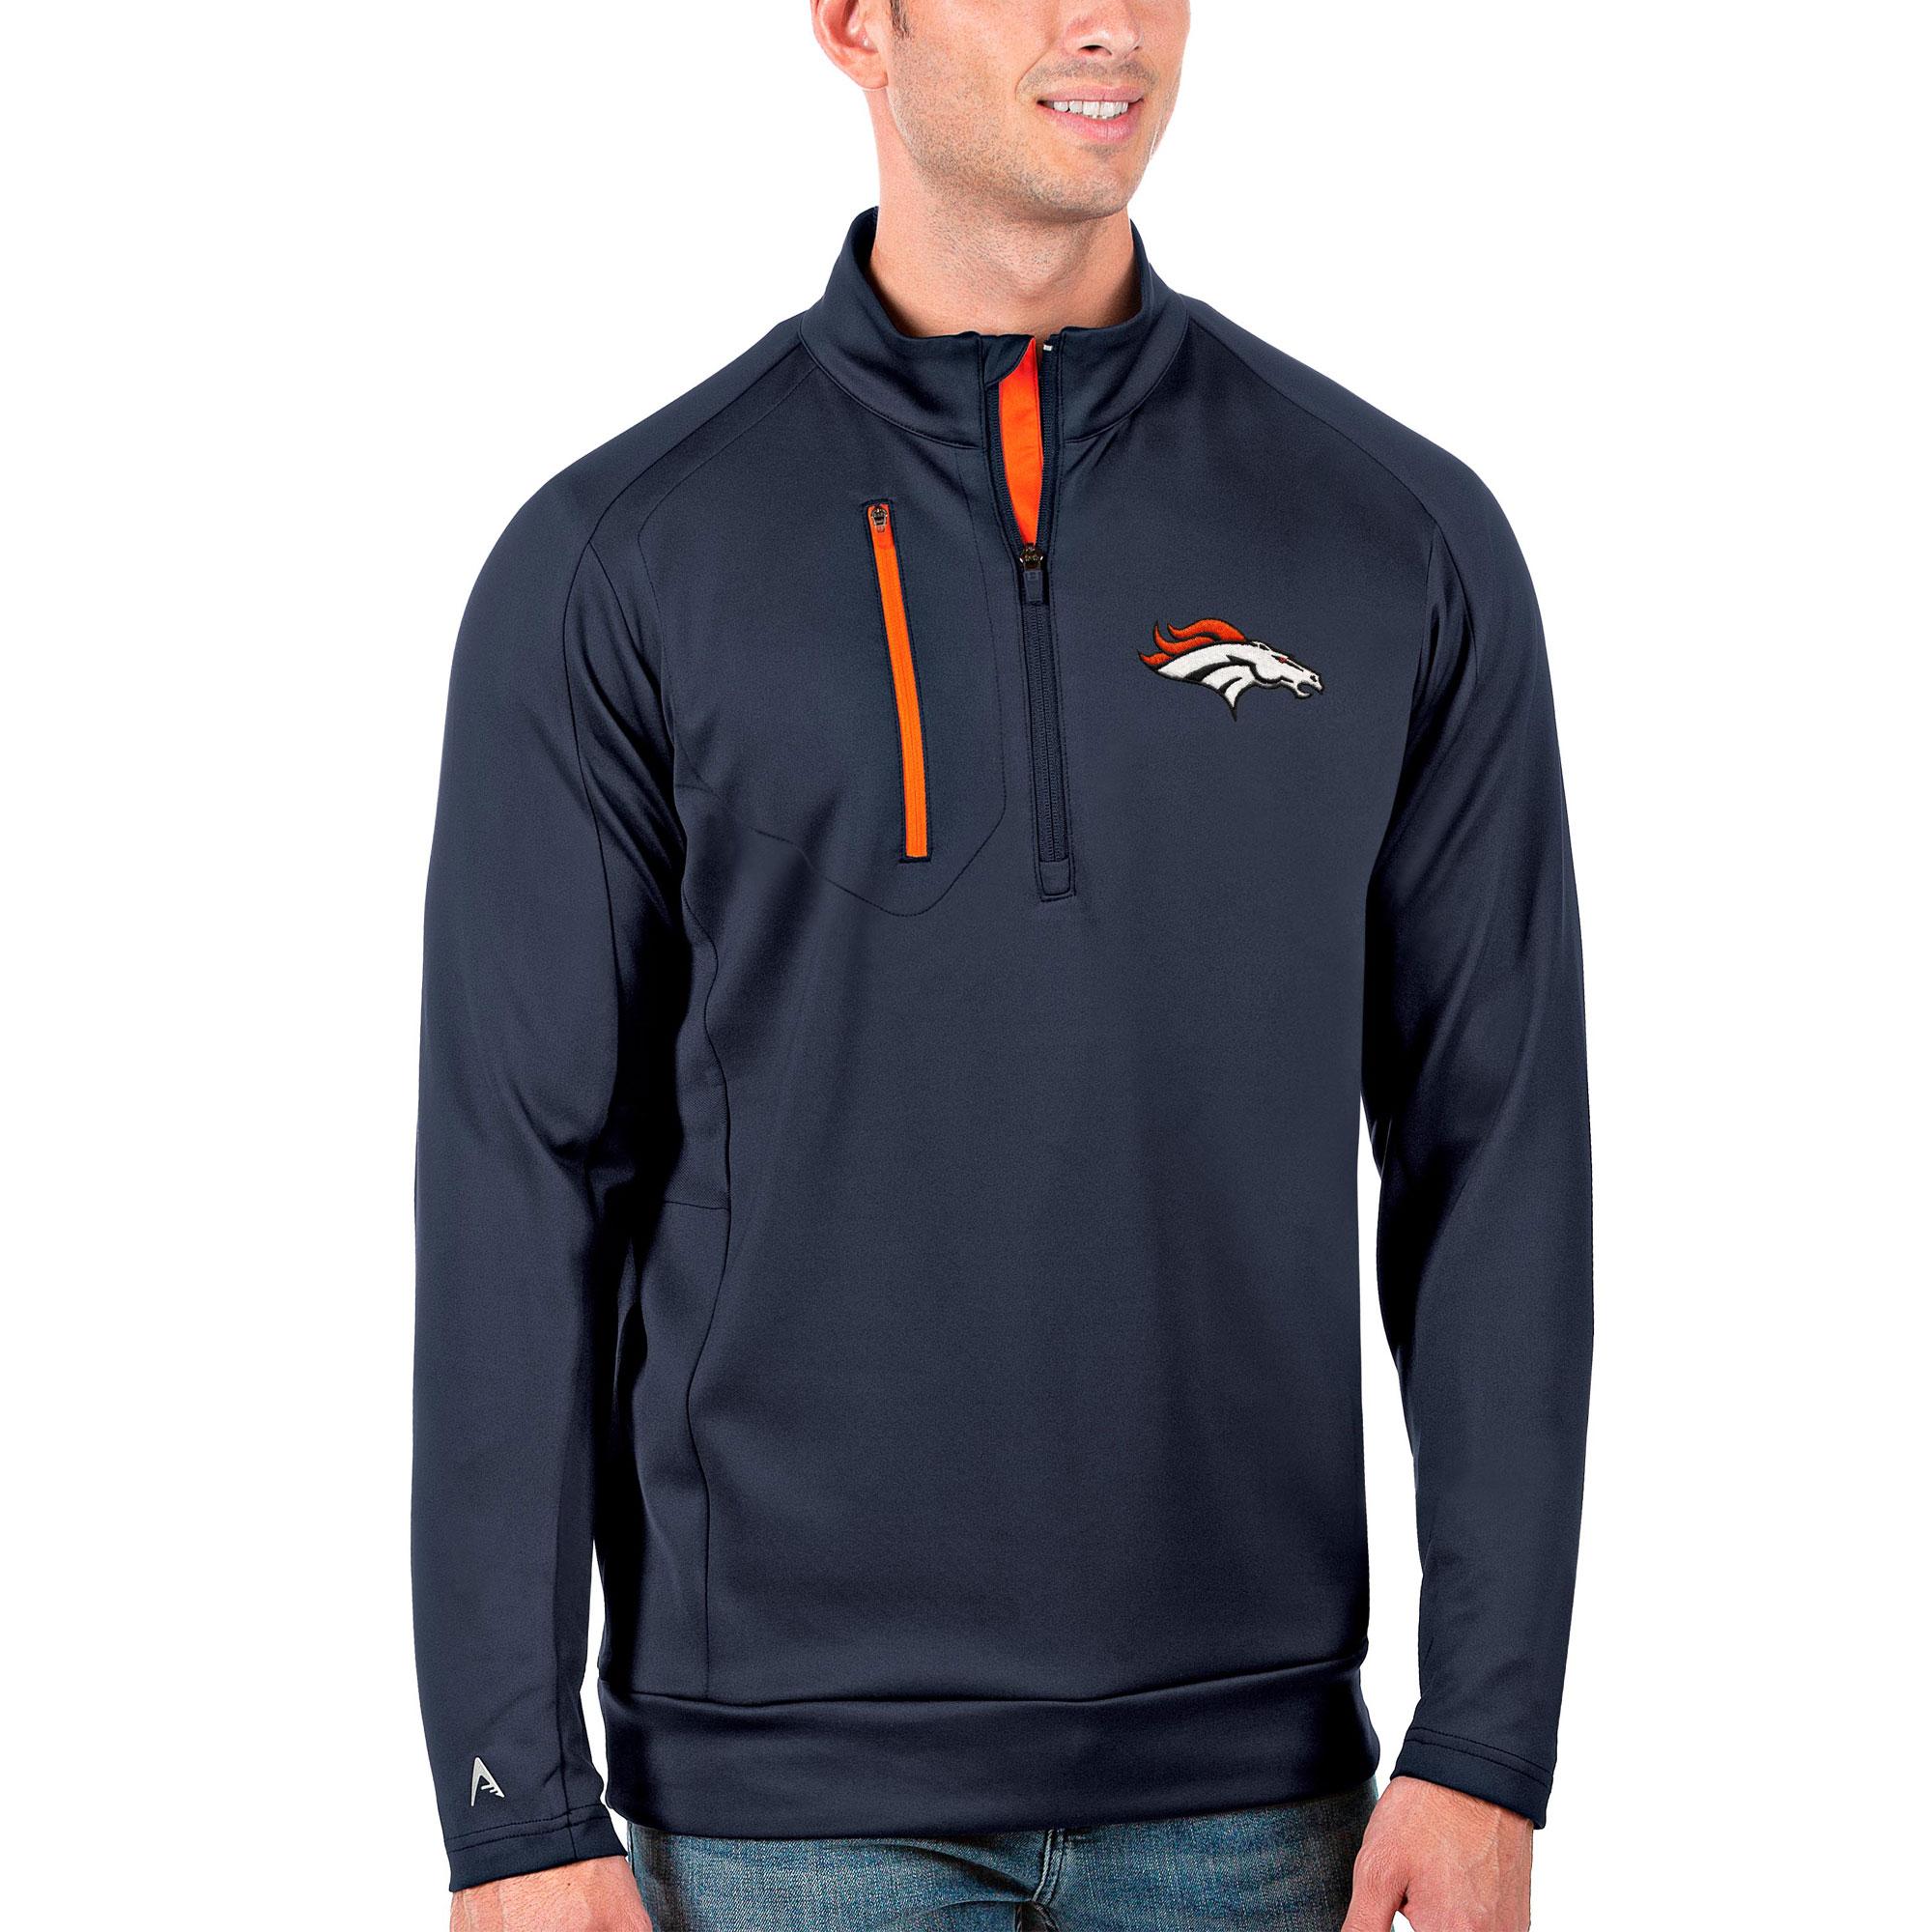 Denver Broncos Antigua Generation Quarter-Zip Pullover Jacket - Navy/Orange